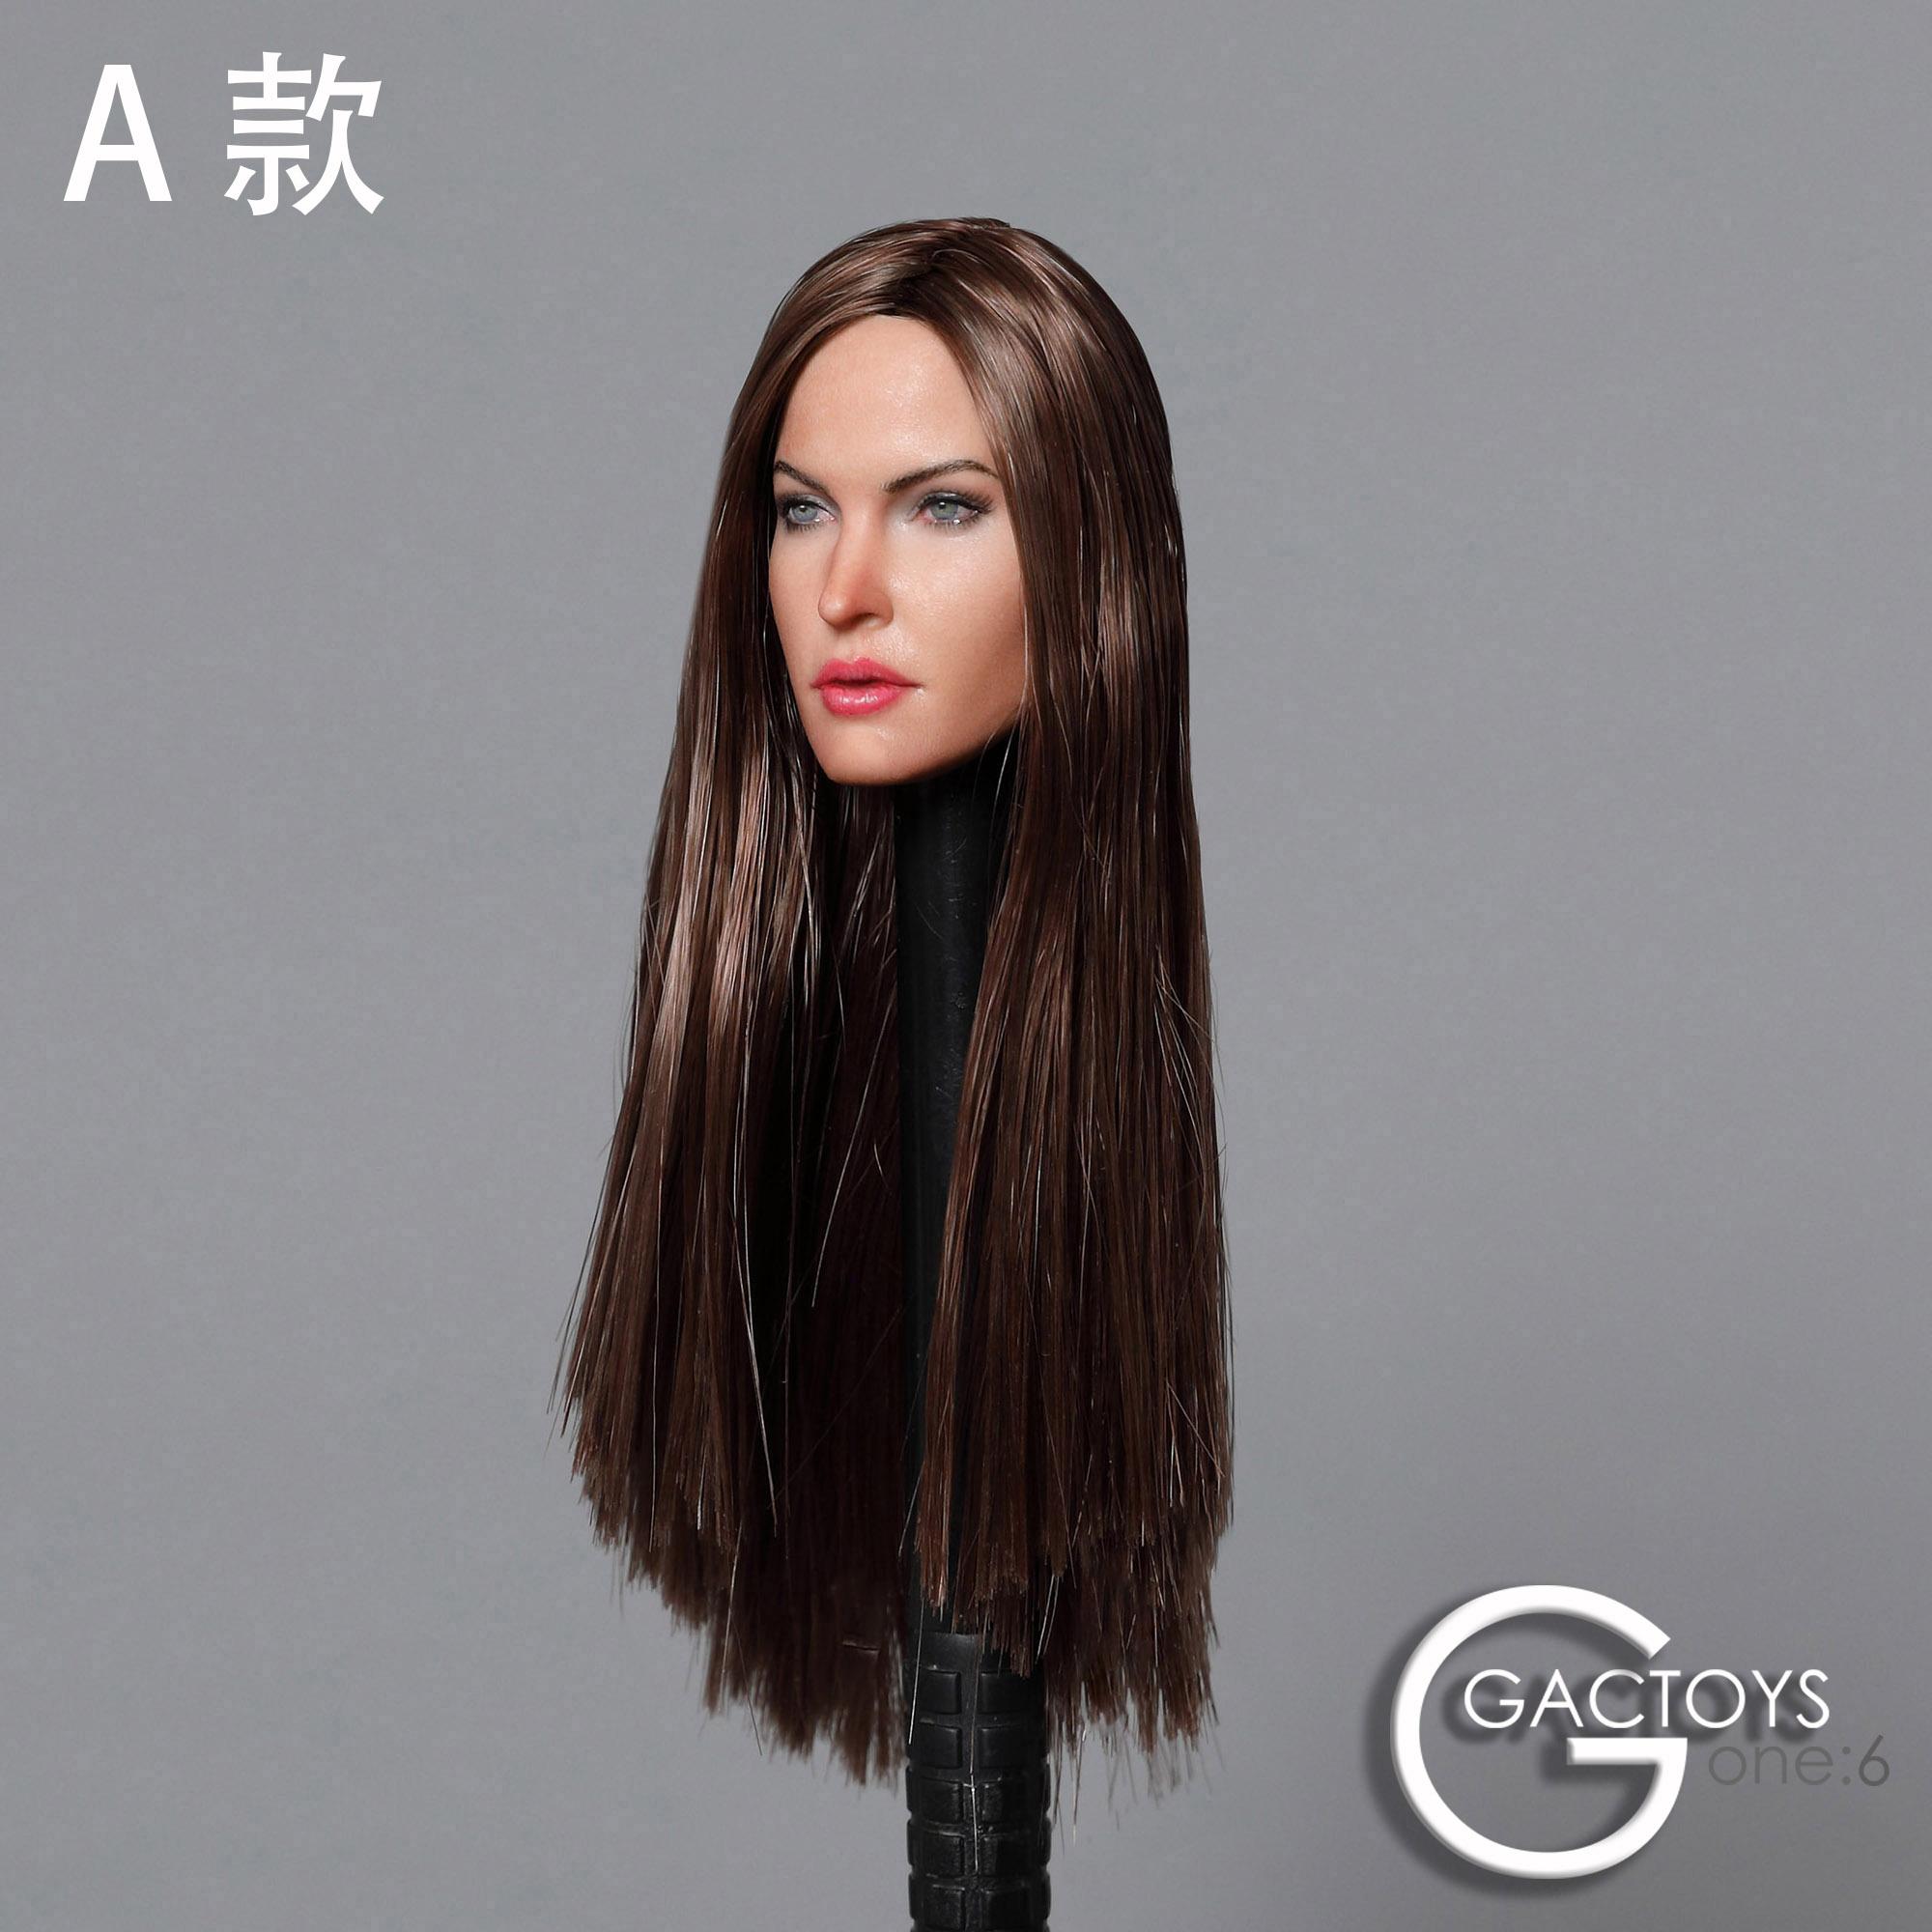 gac-femalehead02